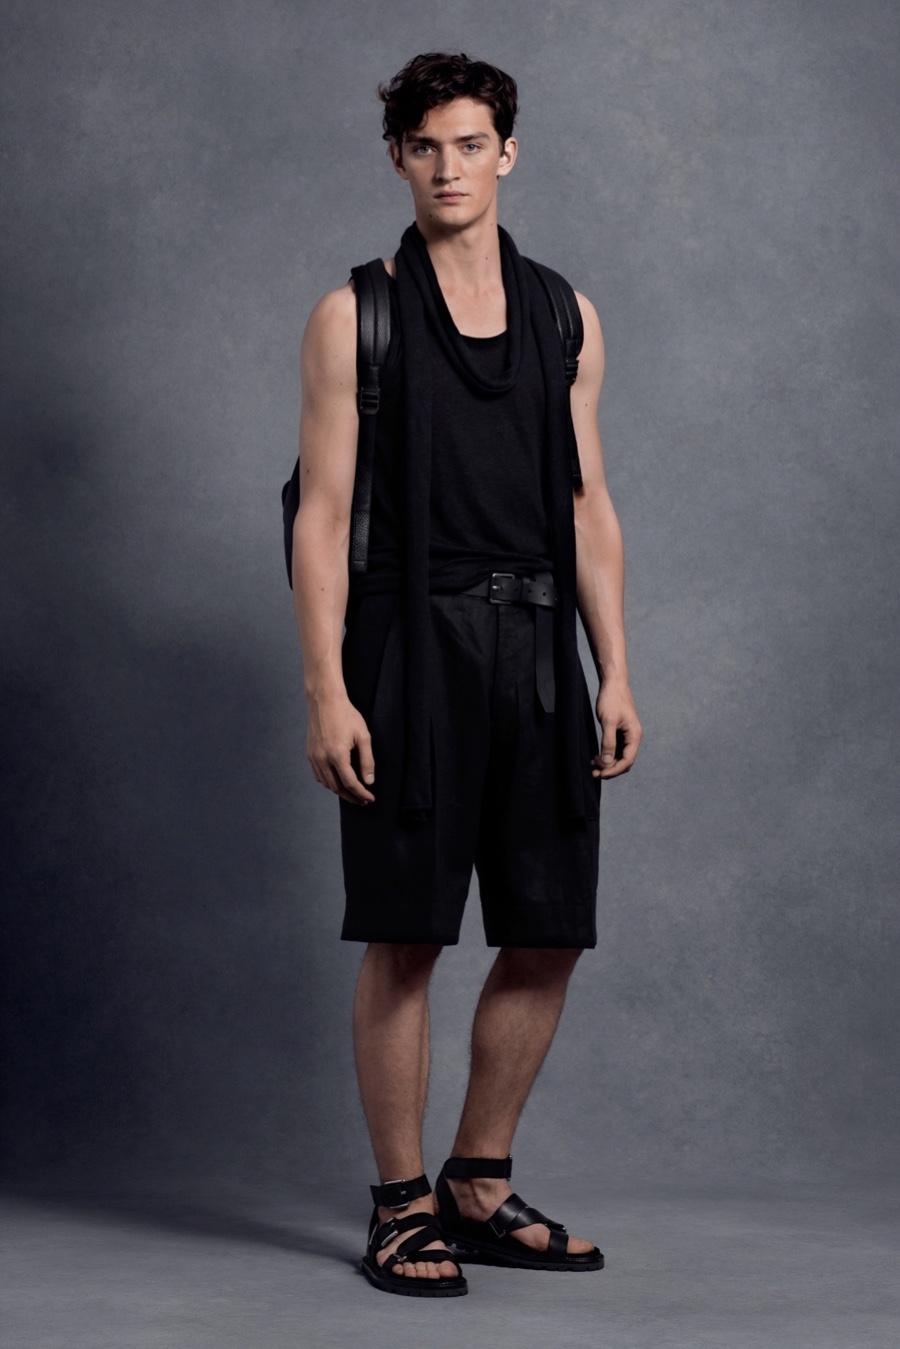 Michael Kors Spring/Summer 2016 Collection   New York Fashion Week: Men